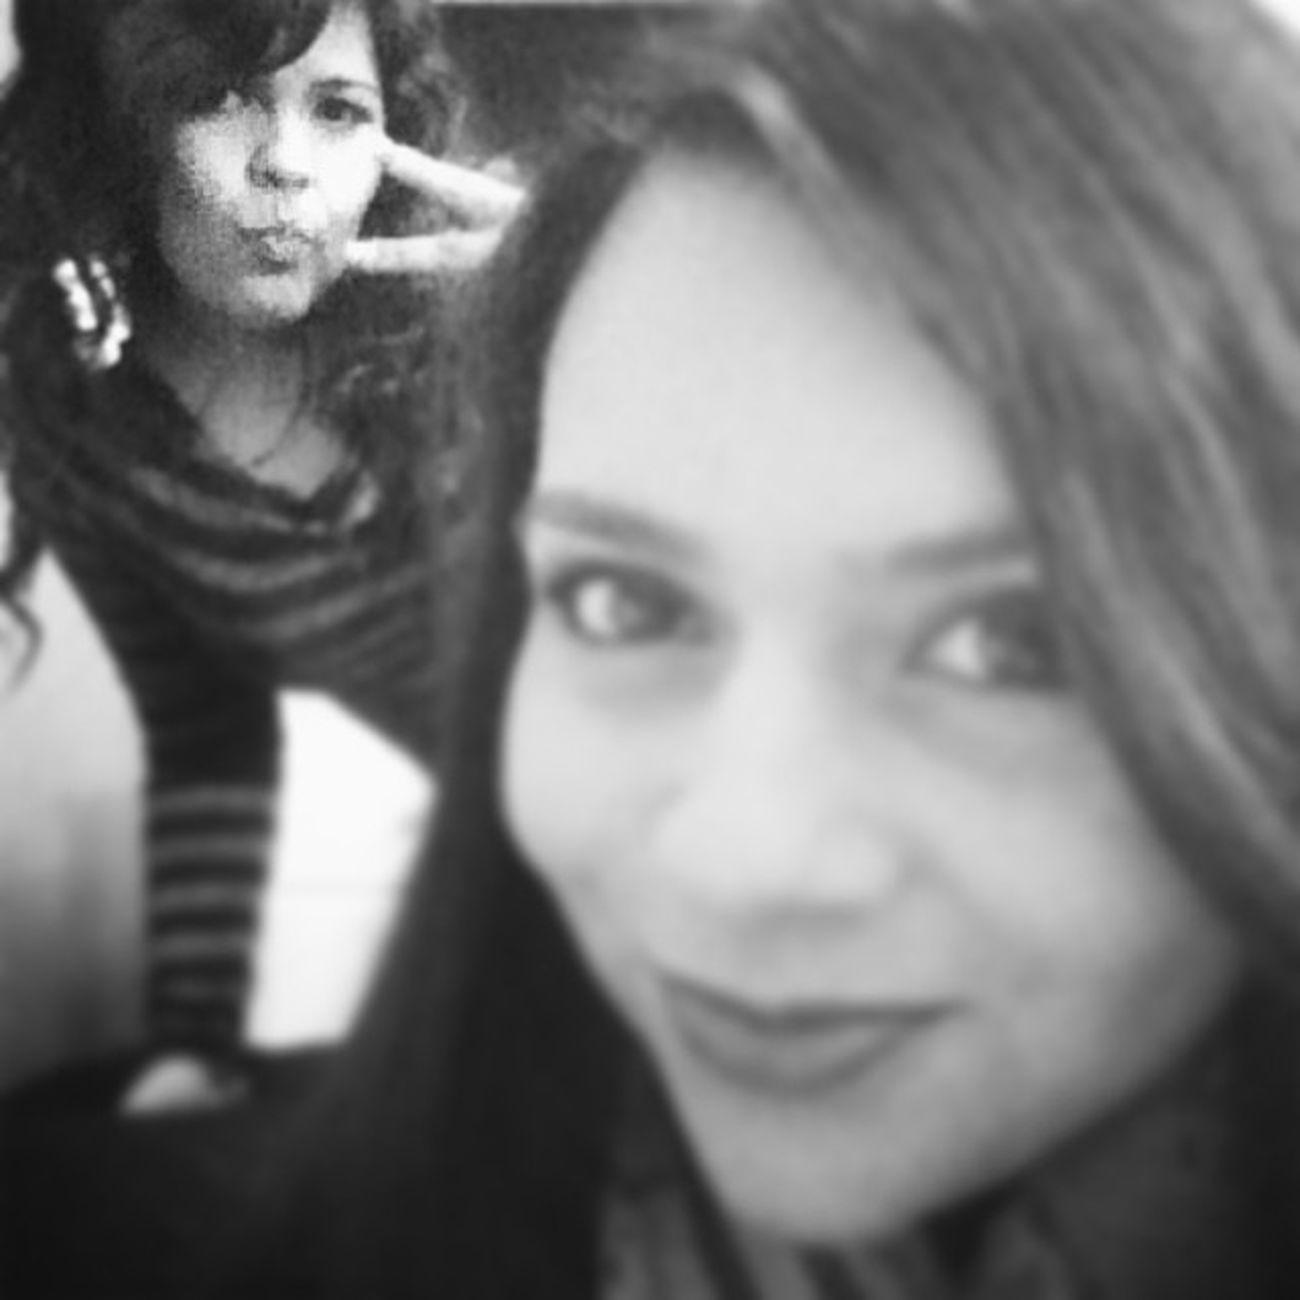 Happy birthday to my cousin @carmelit_27! 21 Birthdaygirl Jefa Cousin car